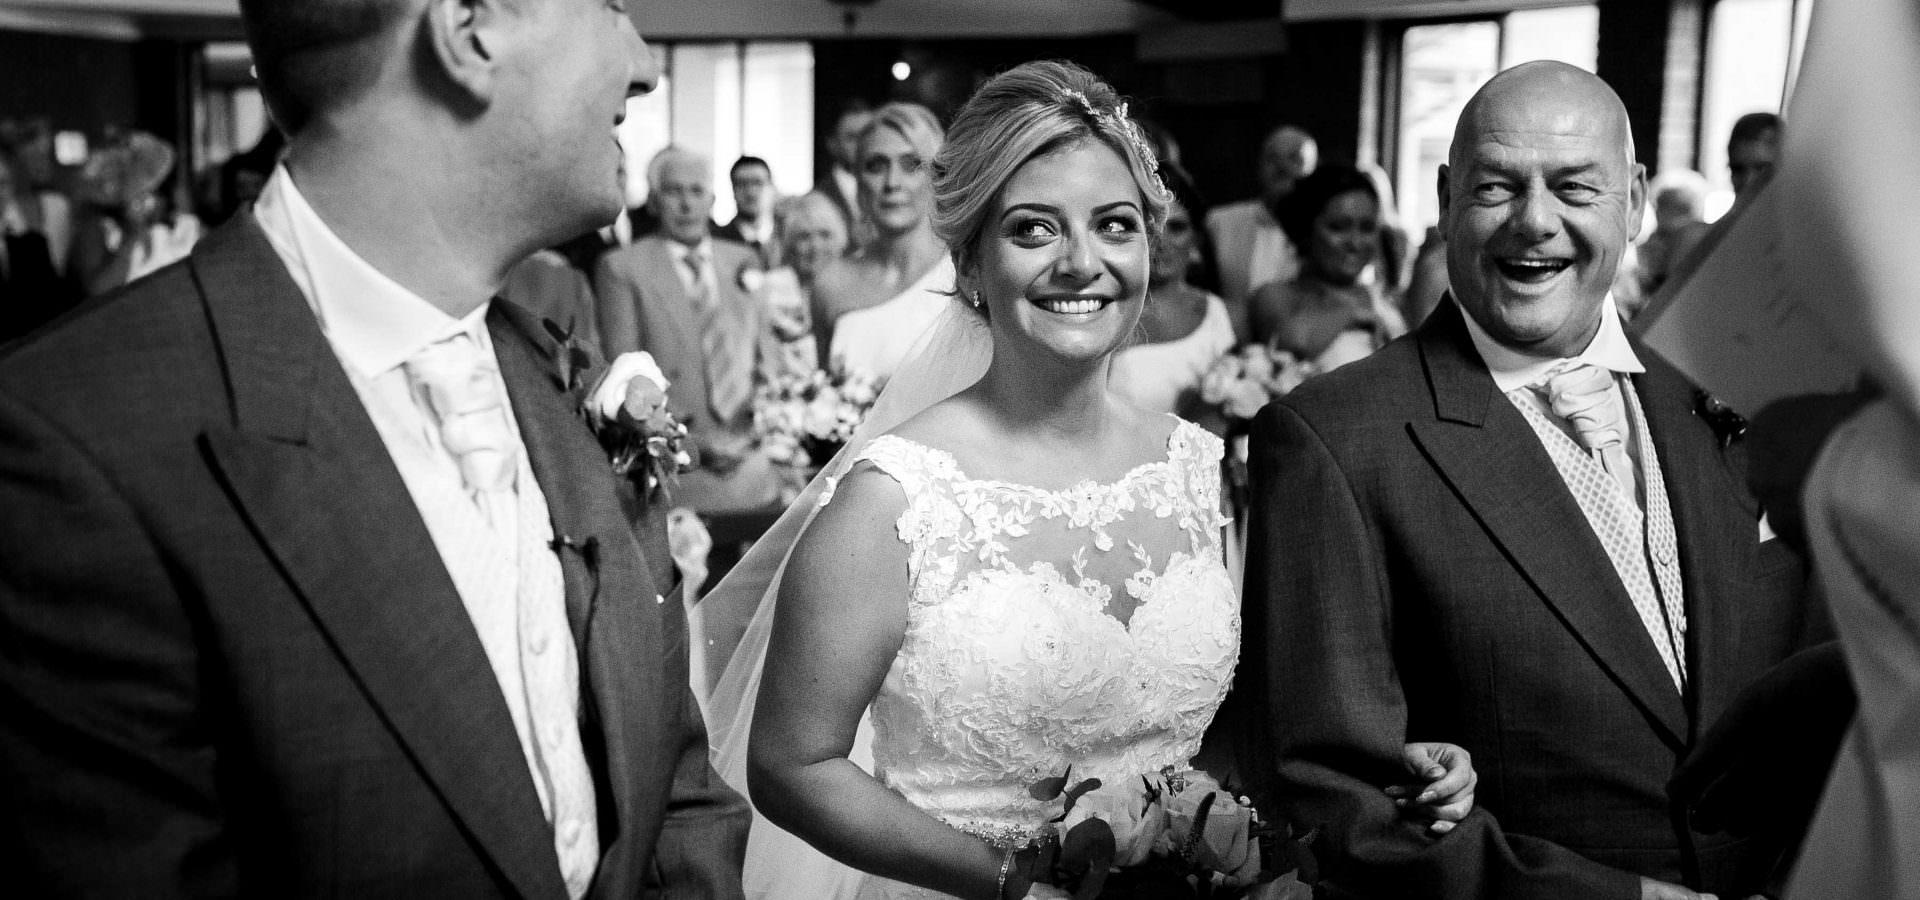 Best North West Wedding Photographer 2016 Awards Nomination